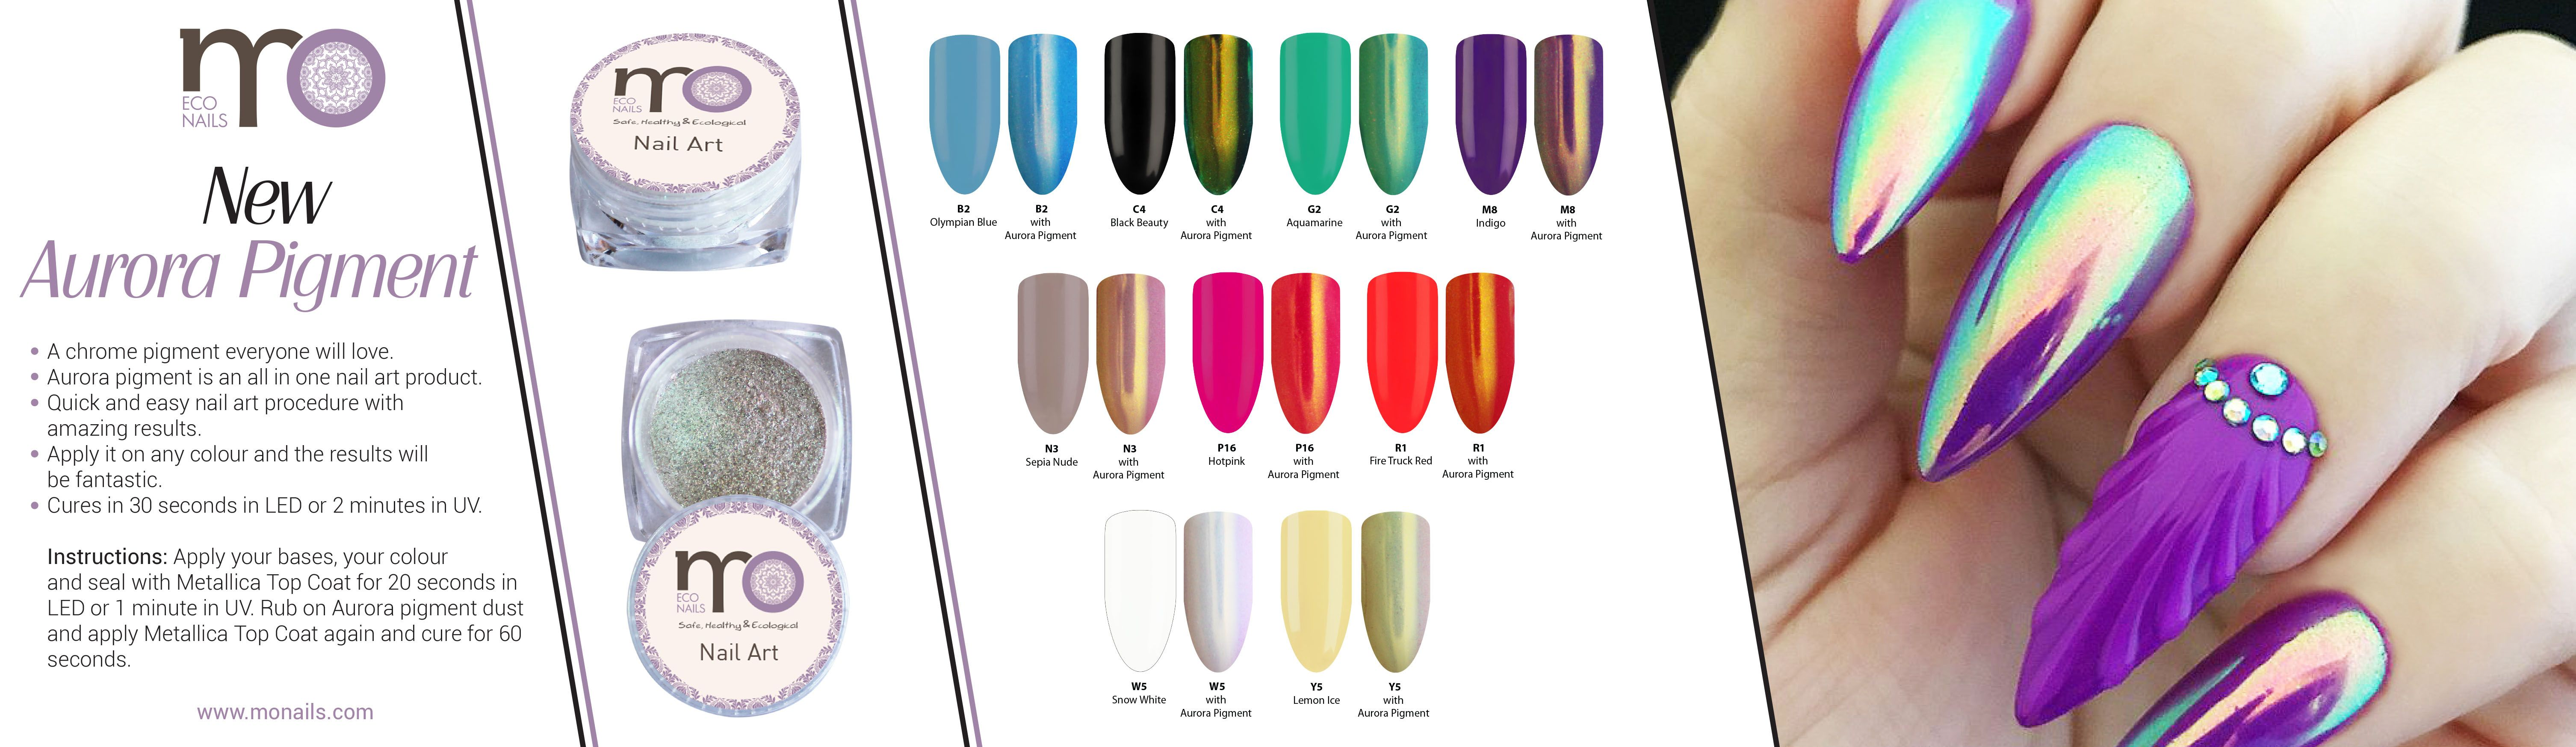 New In Store Aurora Pigment A Chrome Pigment Everyone Will Love